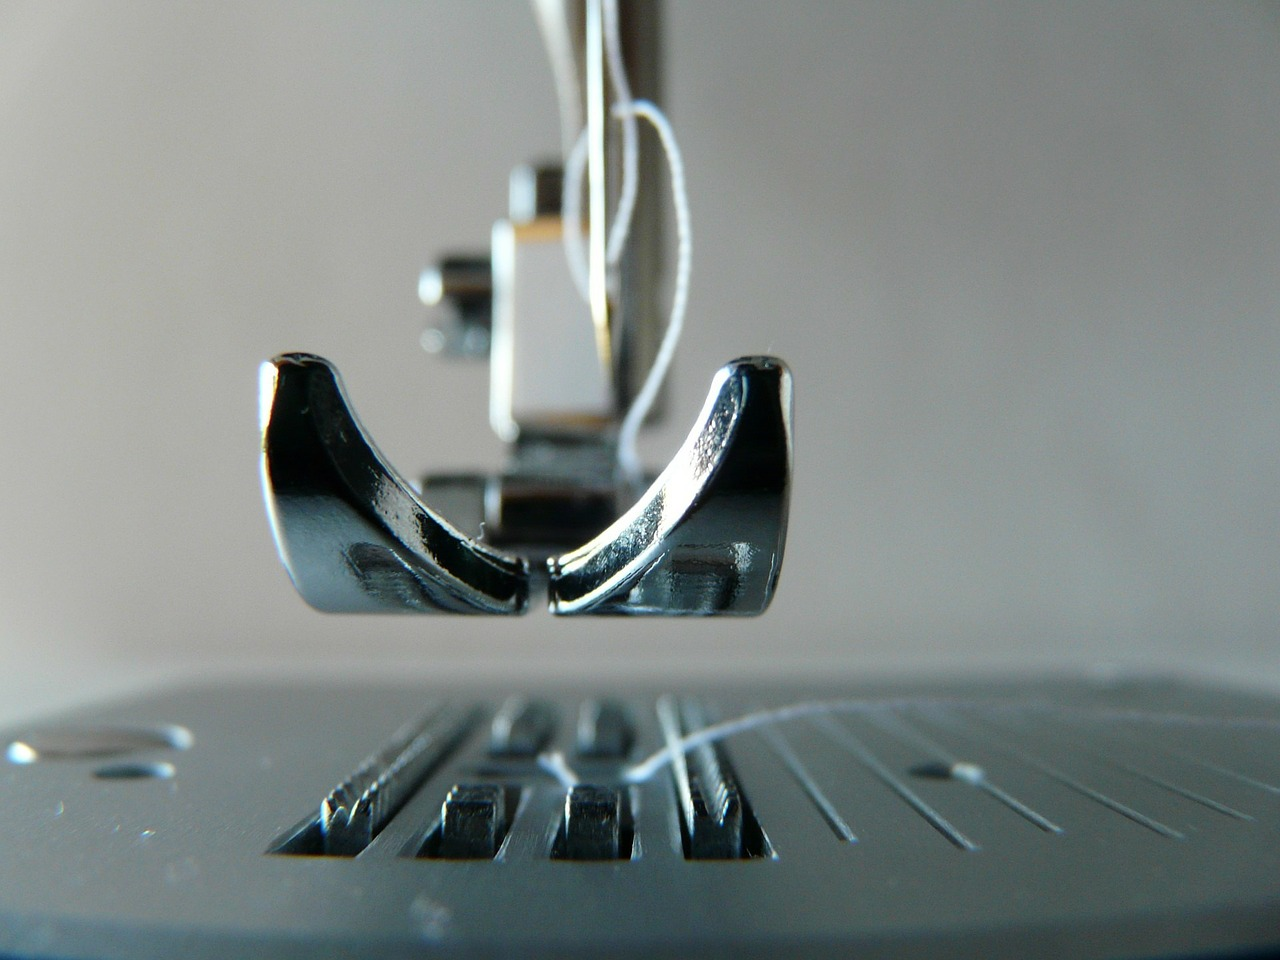 sewing-machine-315382_1280